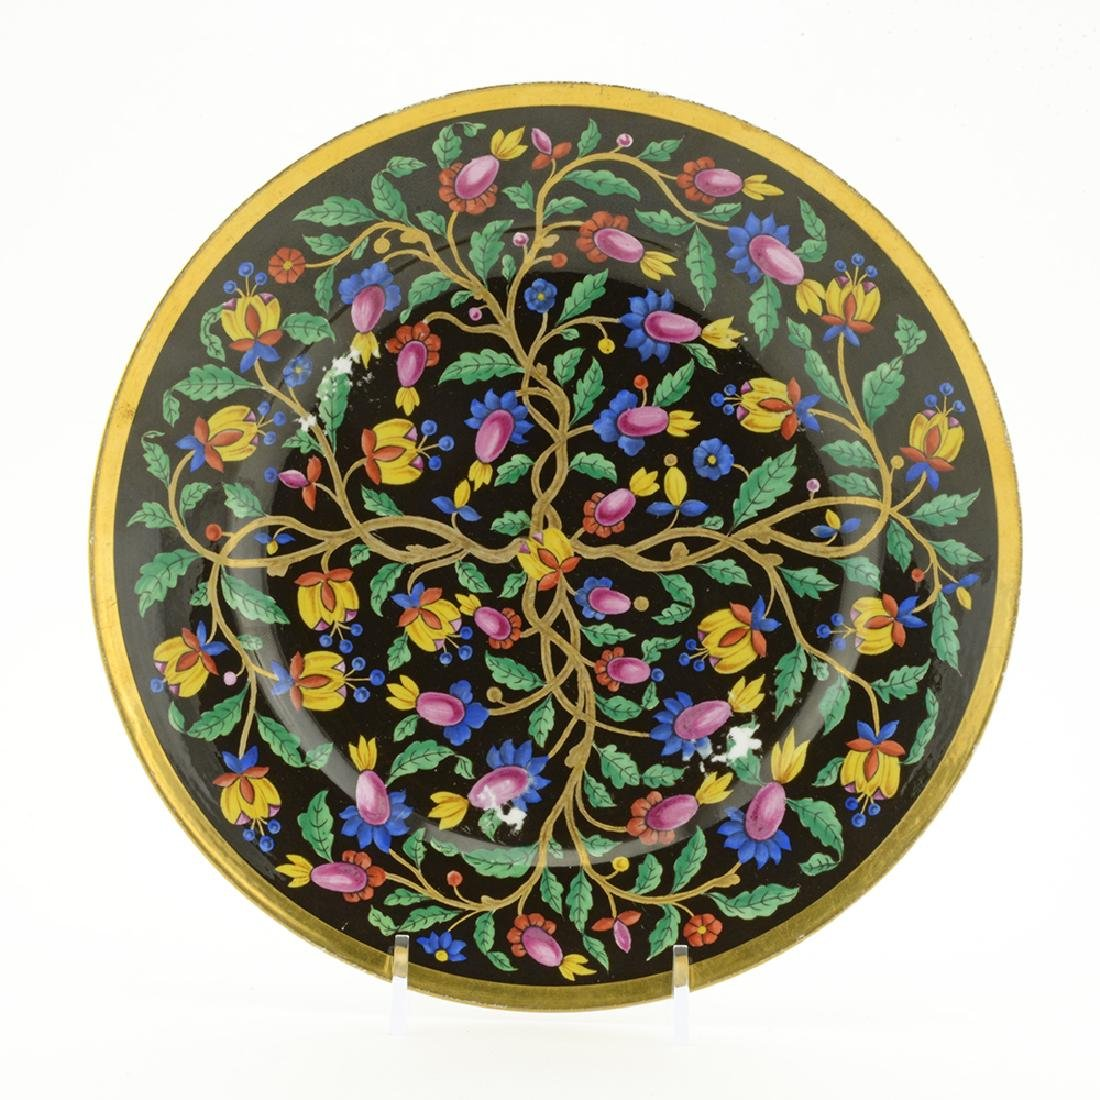 Russian Imperial porcelain dessert plate